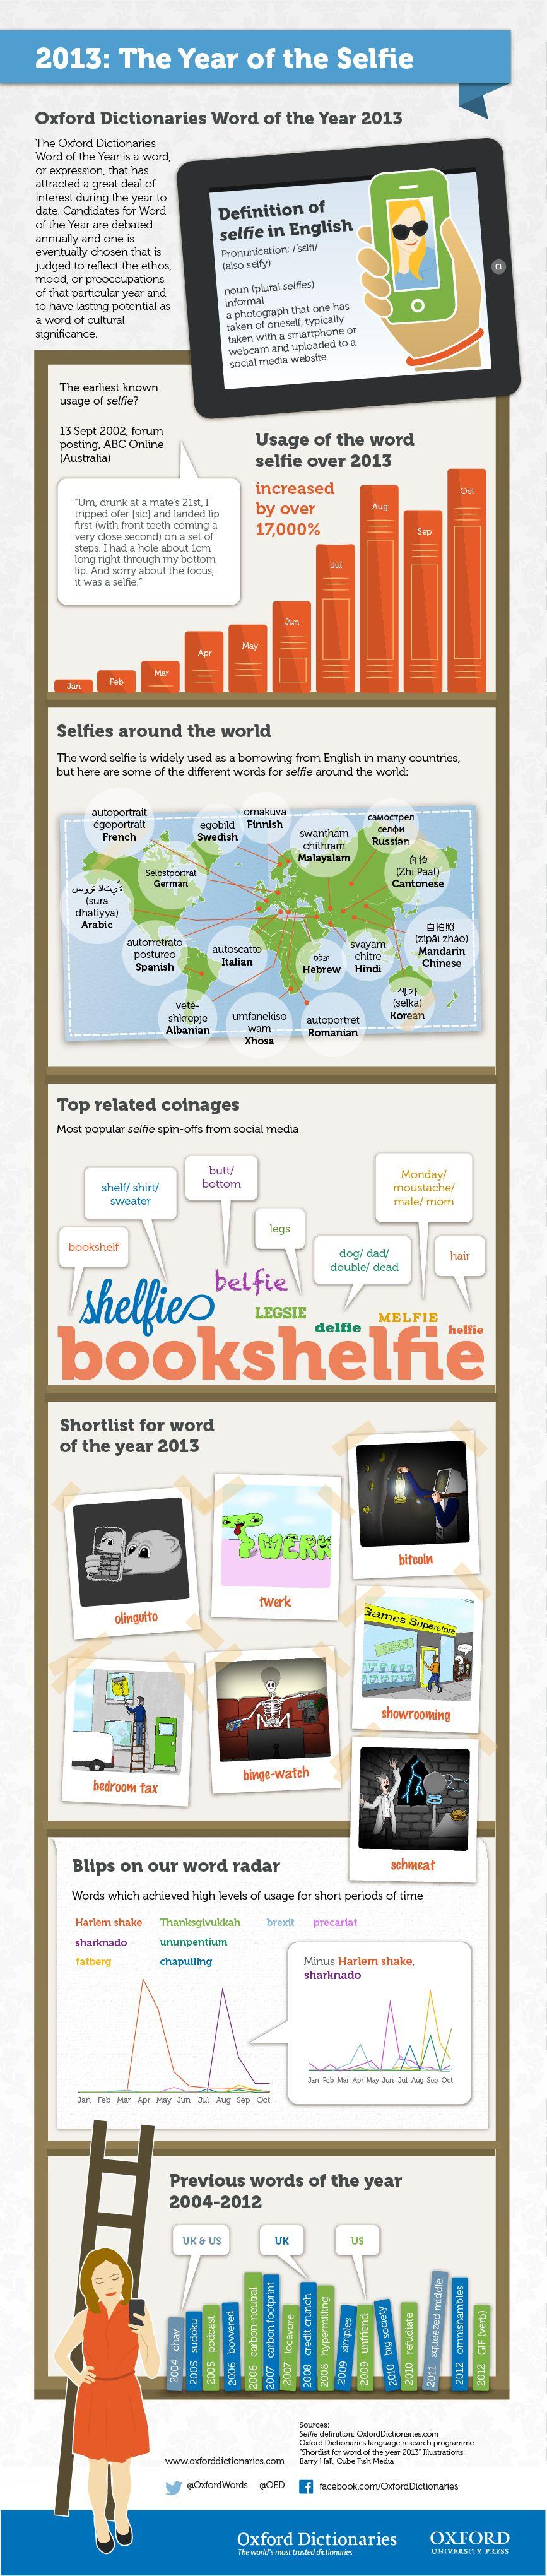 Selfie: Oxford Dictionaries Word of the Year 2013